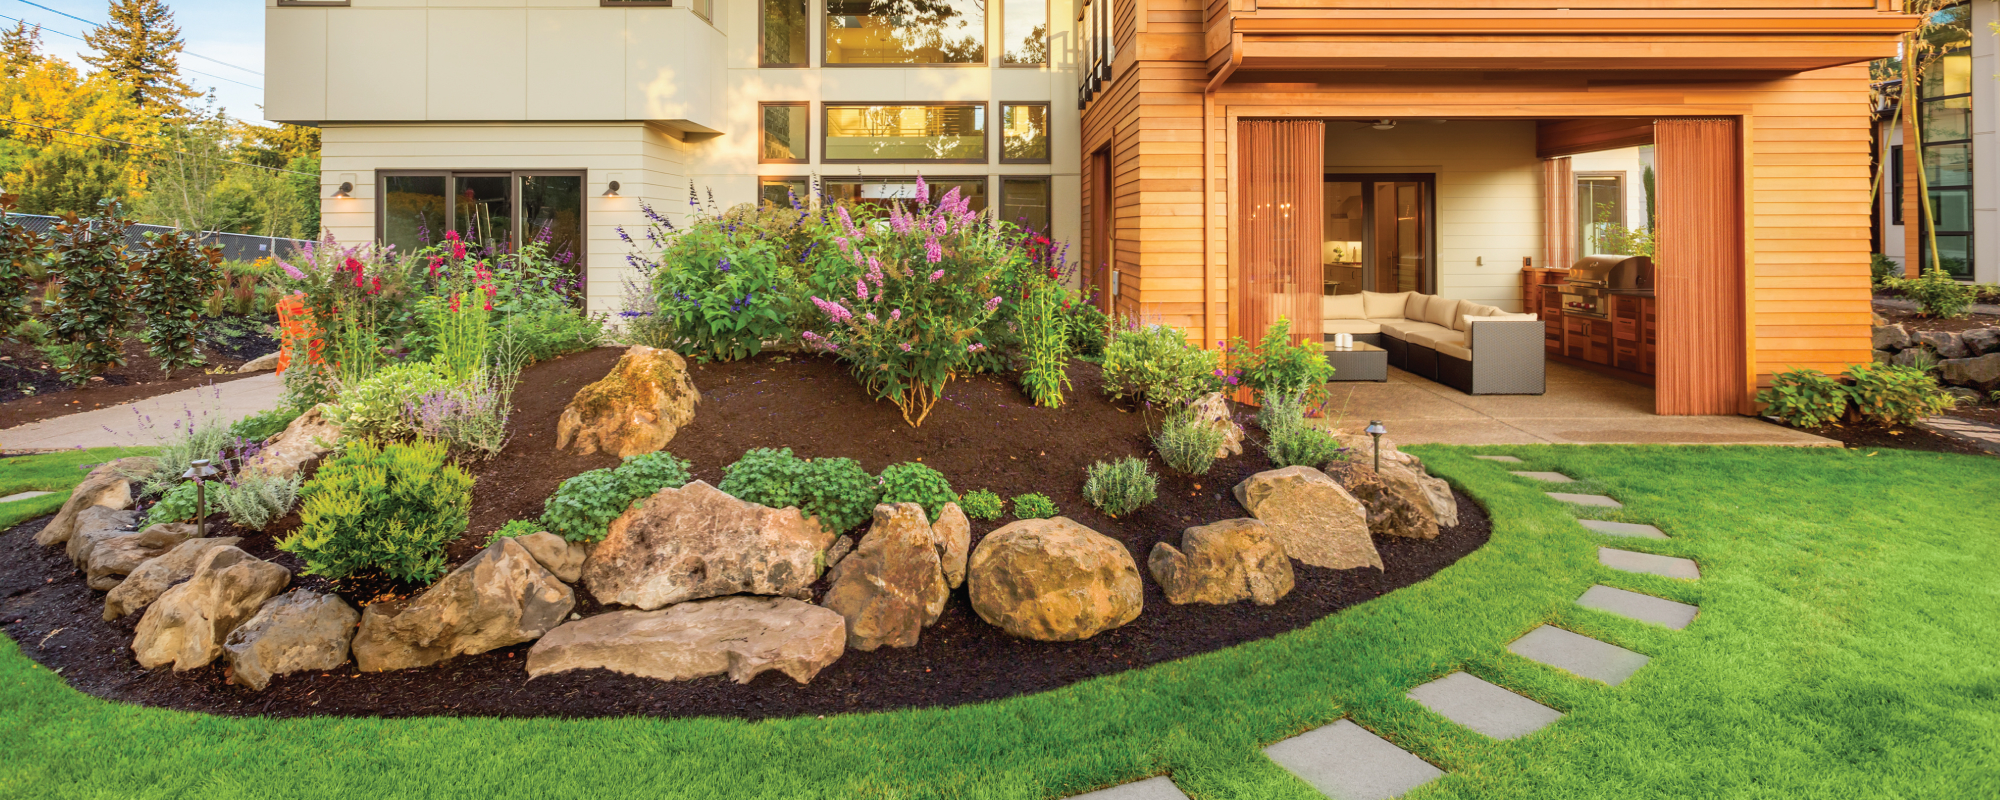 Saanich Landscaping Ltd in Victoria